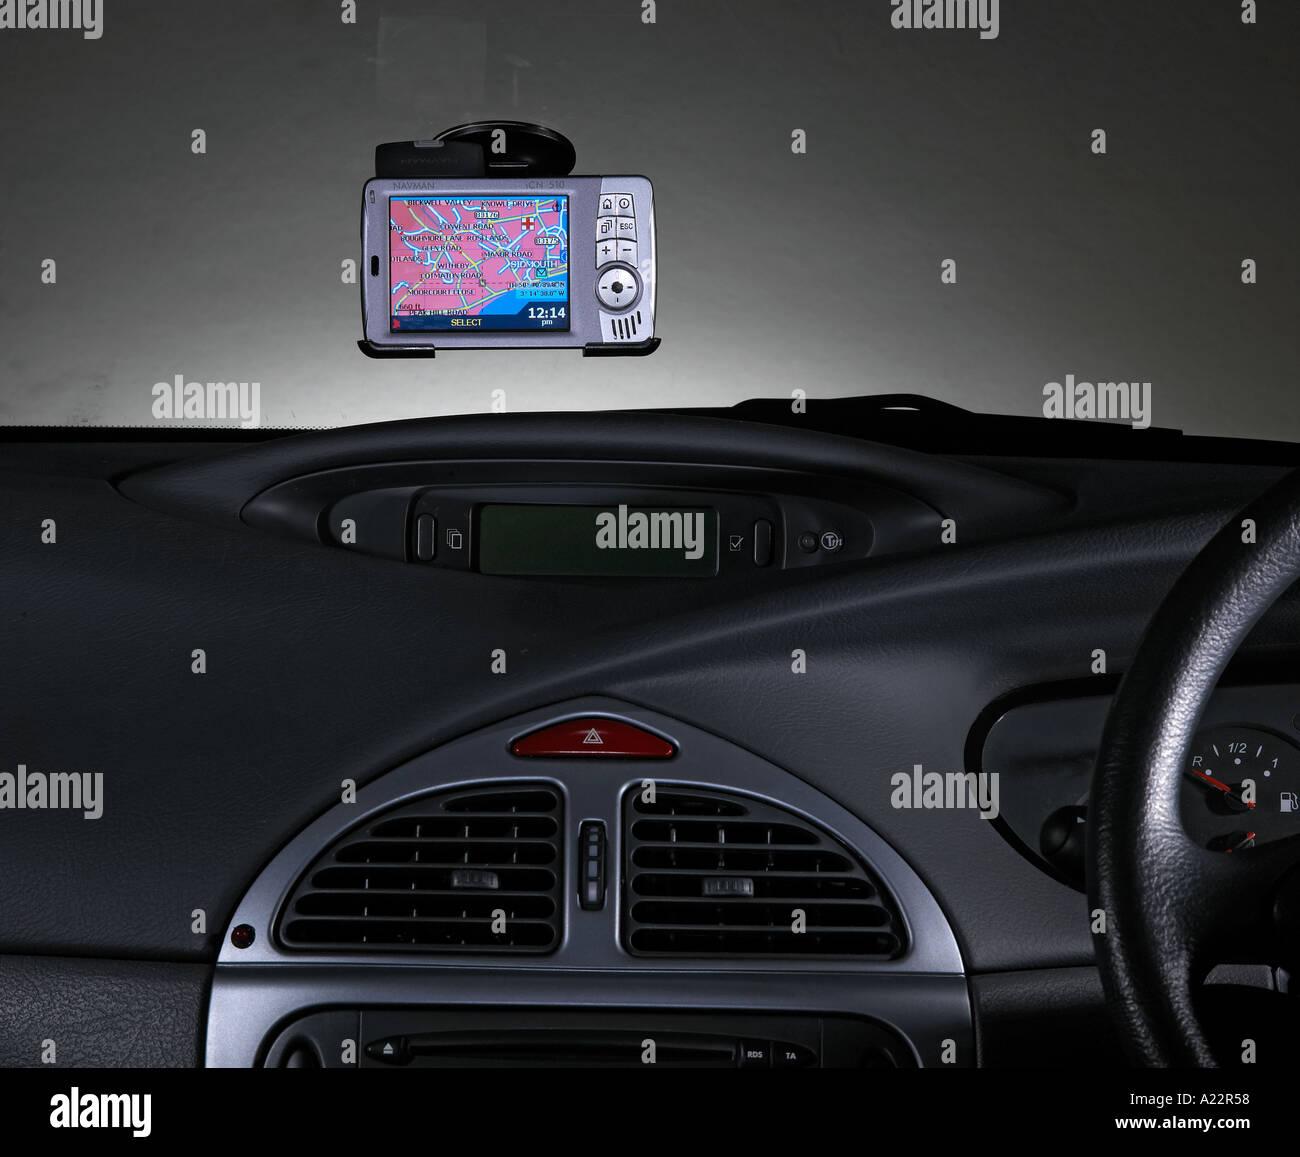 In car Satellite Navigation - Stock Image